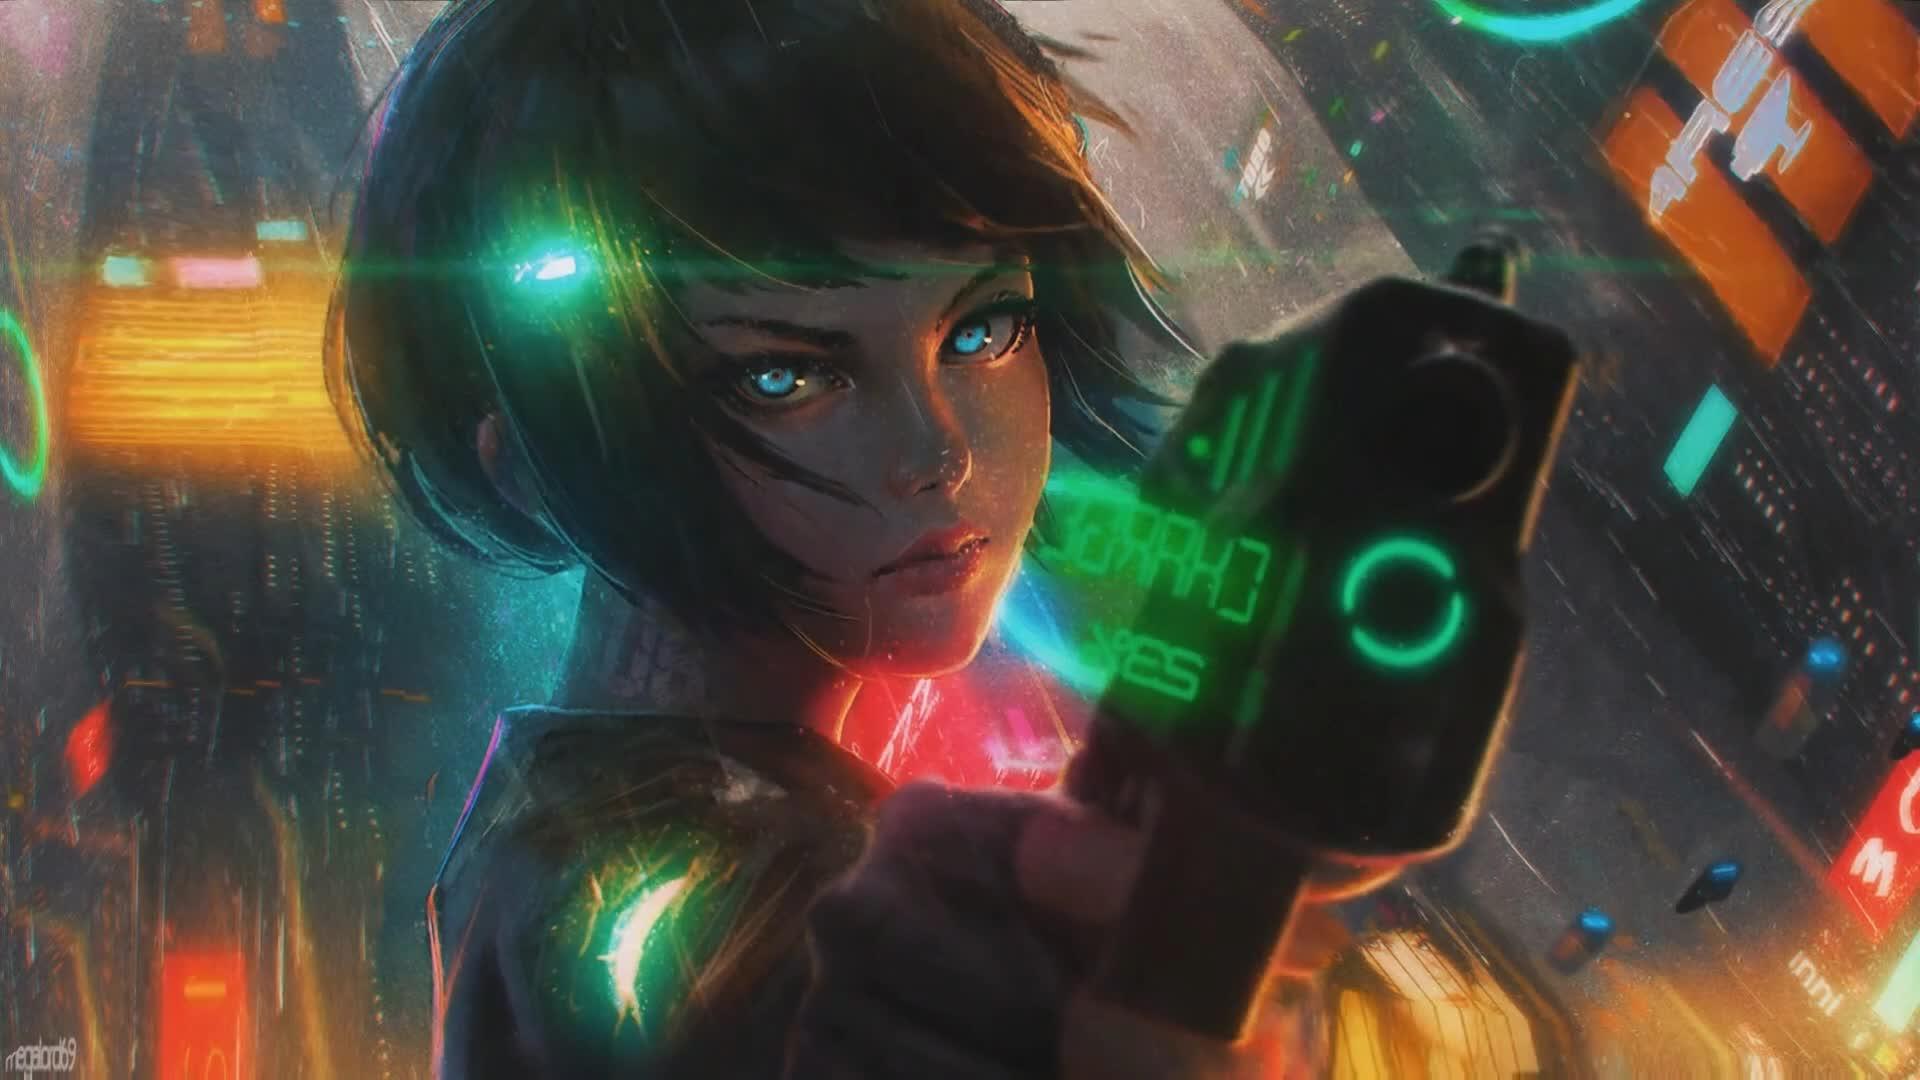 Cyberpunk Girl In Rain Wallpapers Wallpaper Cave